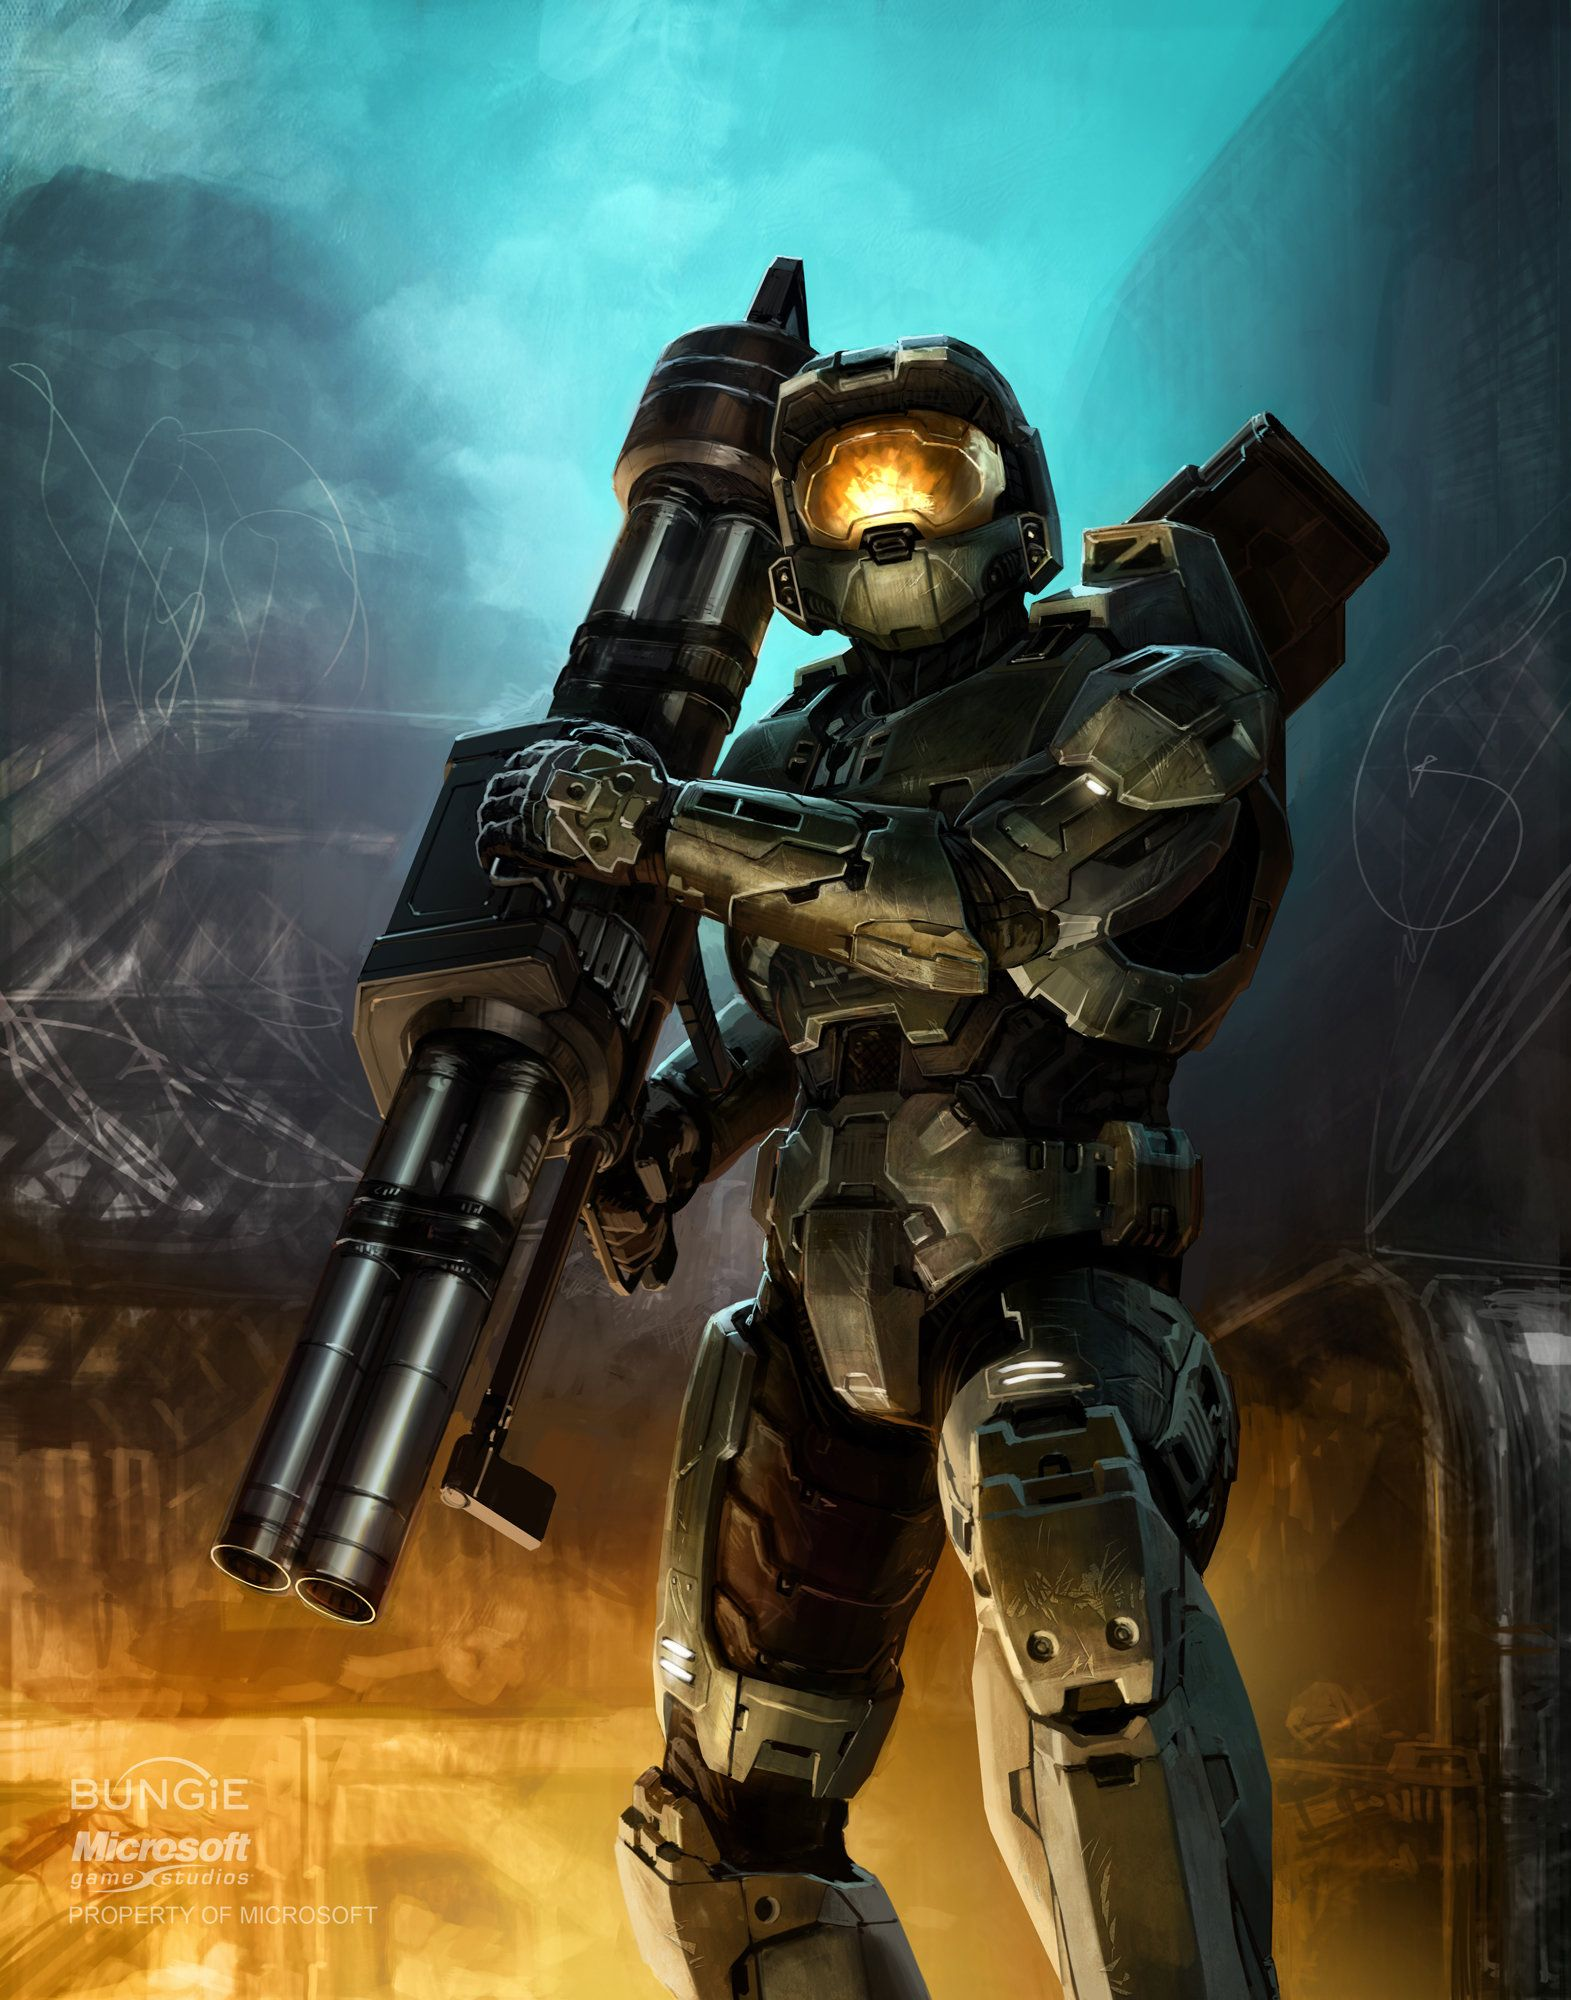 ArtStation Halo 3 Magazine cover Masterchief and rocket